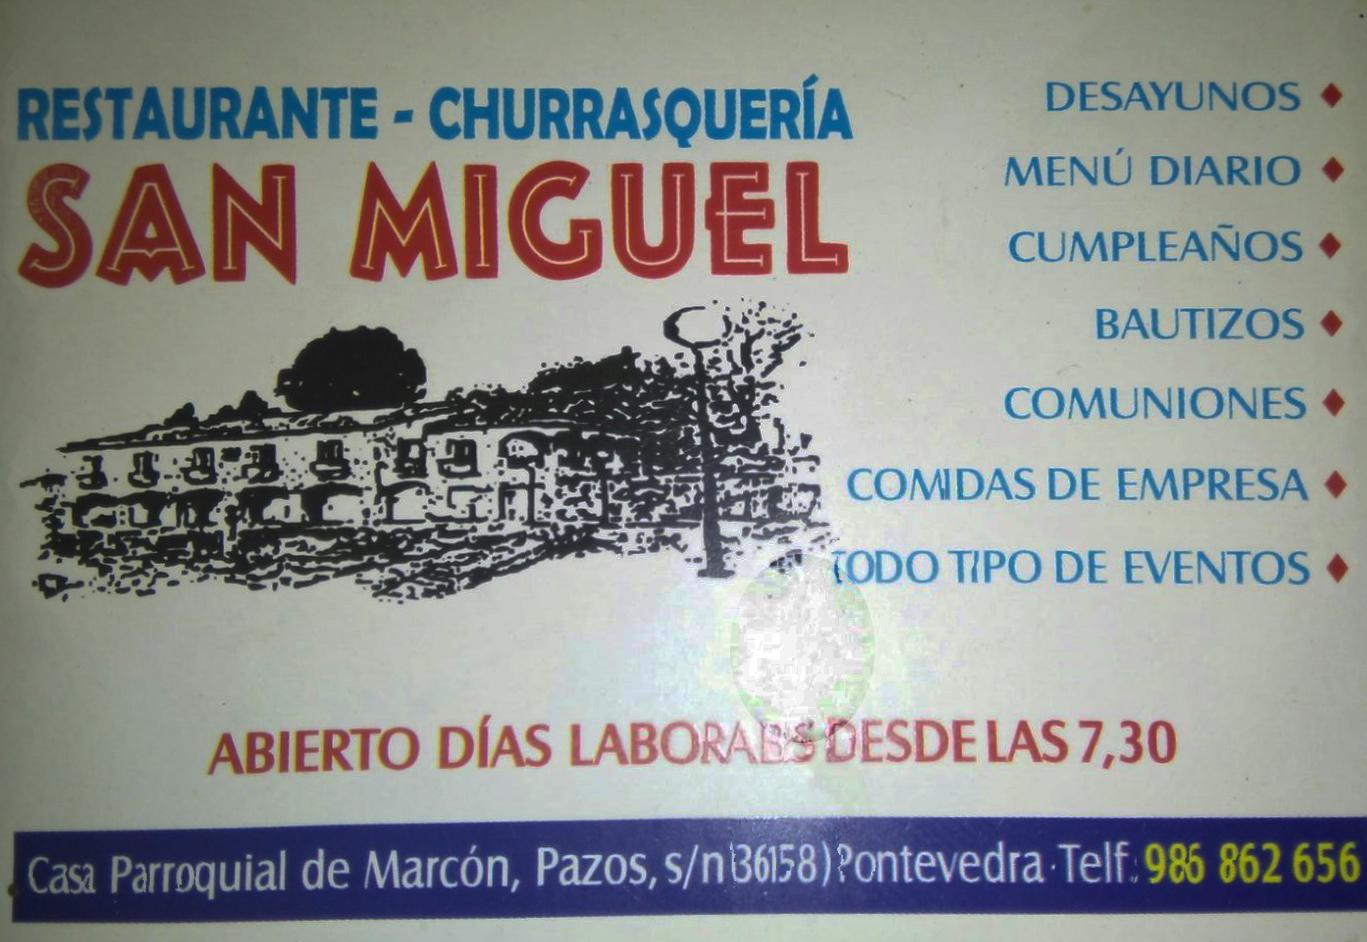 RESTAURANTE-CHURRASQUERIA SAN MIGUEL